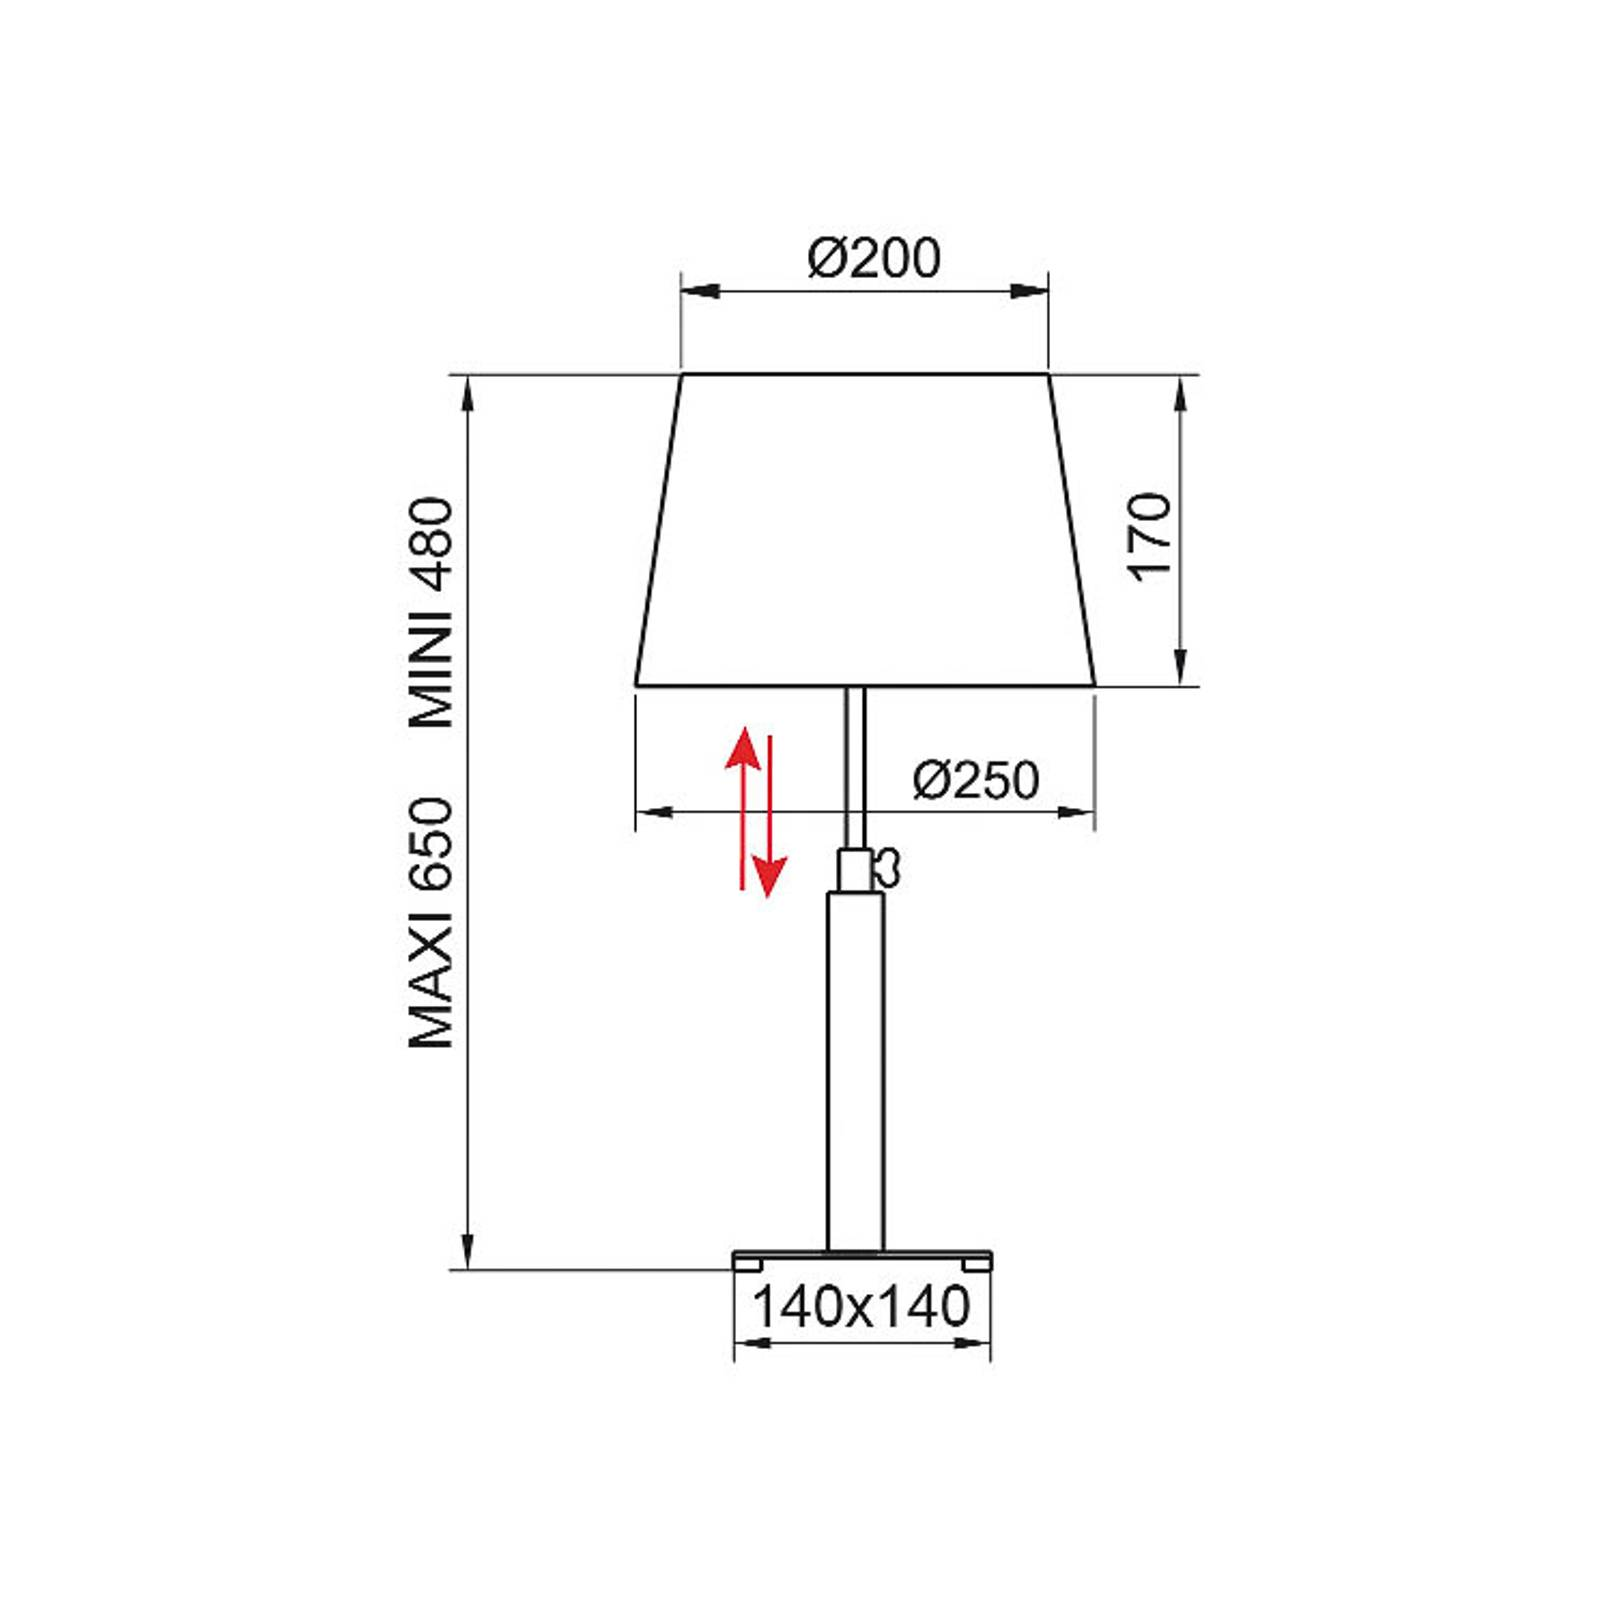 Aluminor Quatro Up-pöytälamppu, harmaa tammi/kromi